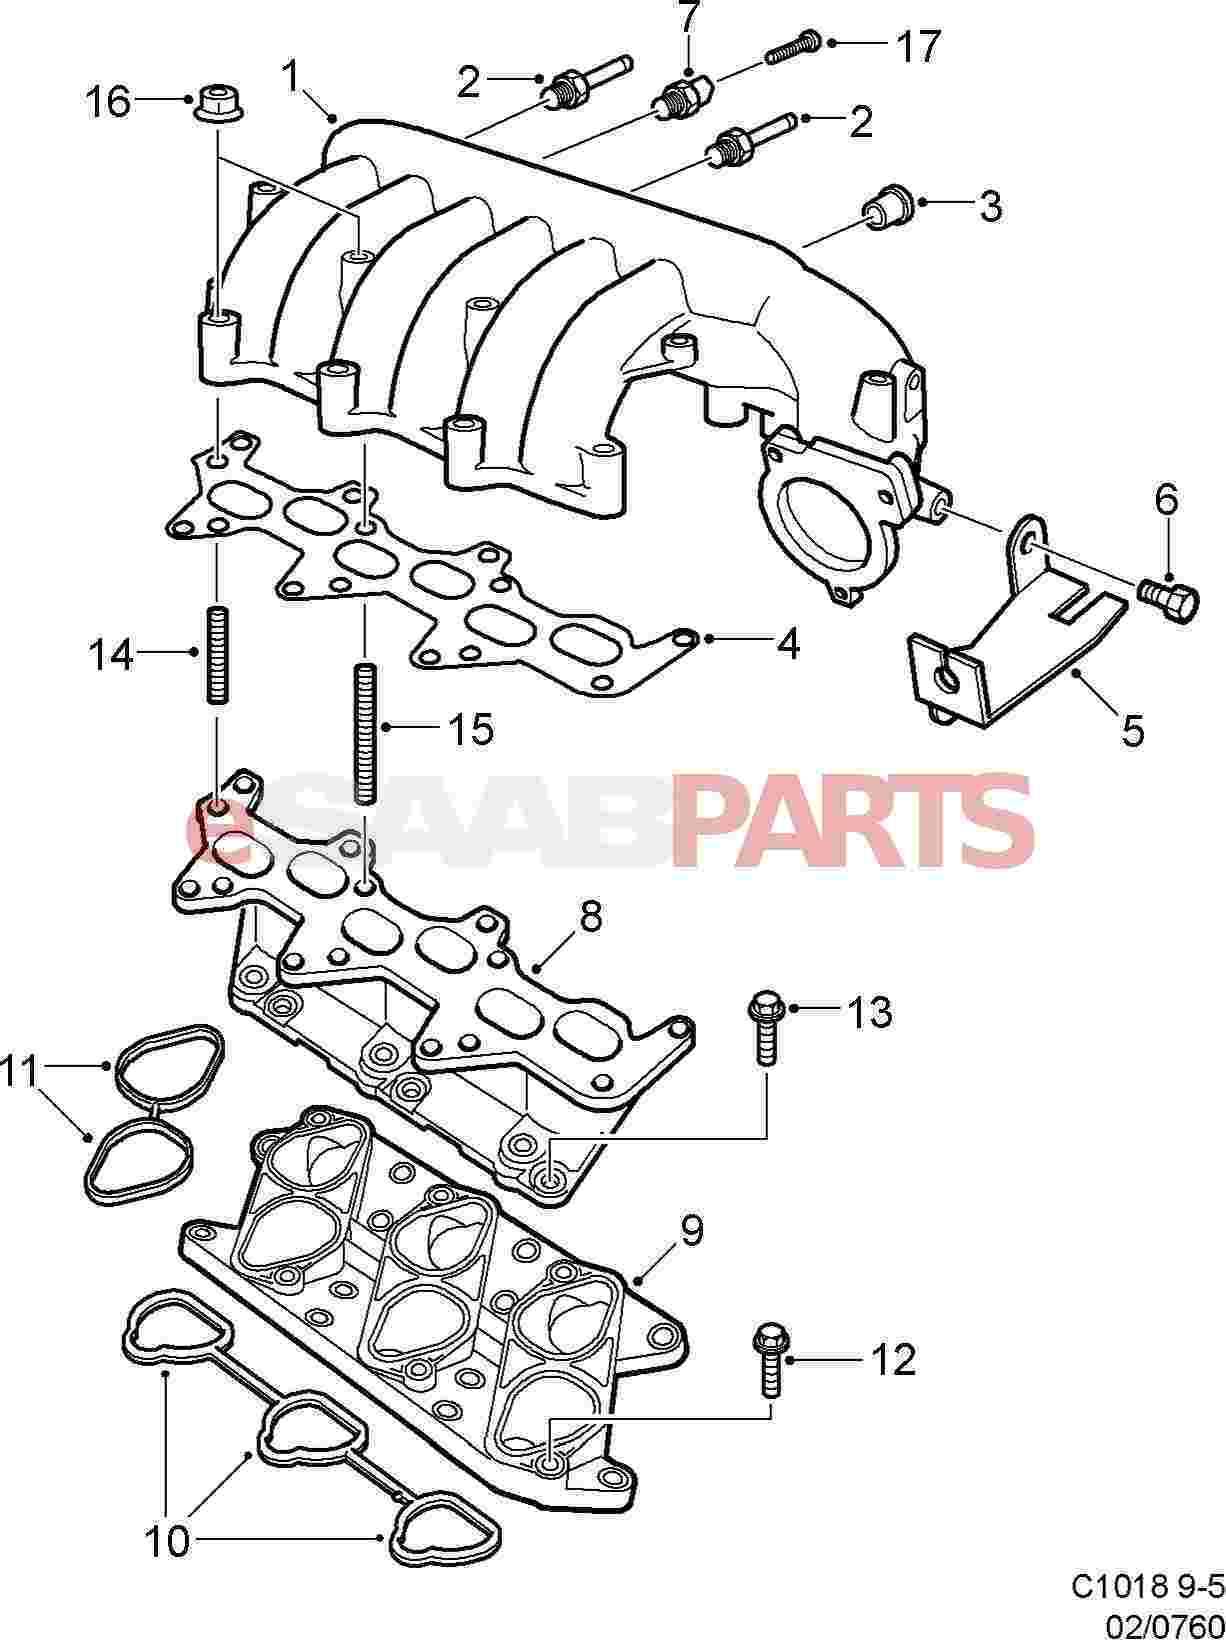 Saab 9 5 Intake Diagram Reinvent Your Wiring 2003 Engine Esaabparts Com 9600 U003e Parts Manifold Rh